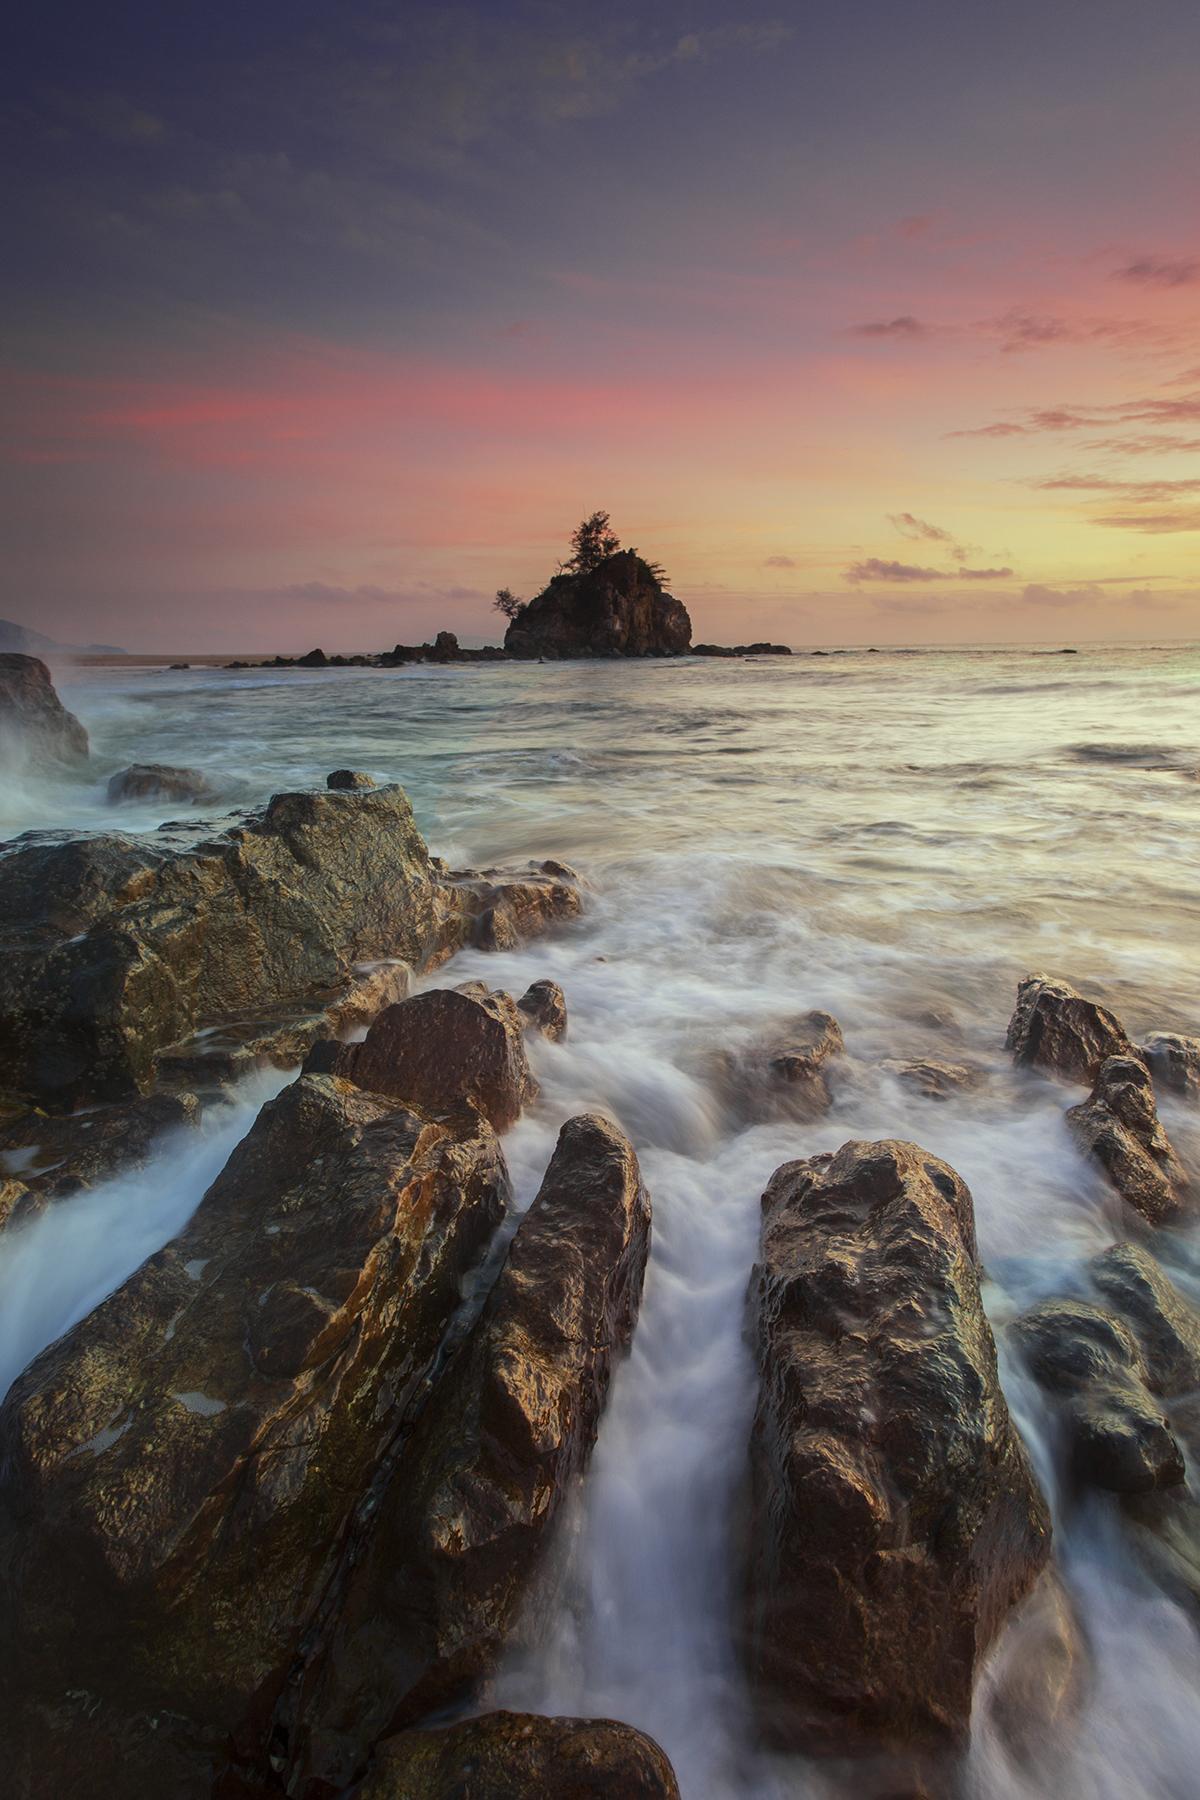 Scenery Wallpaper Hd Free Download Free Stock Photo Of Beach Bora Bora Flow